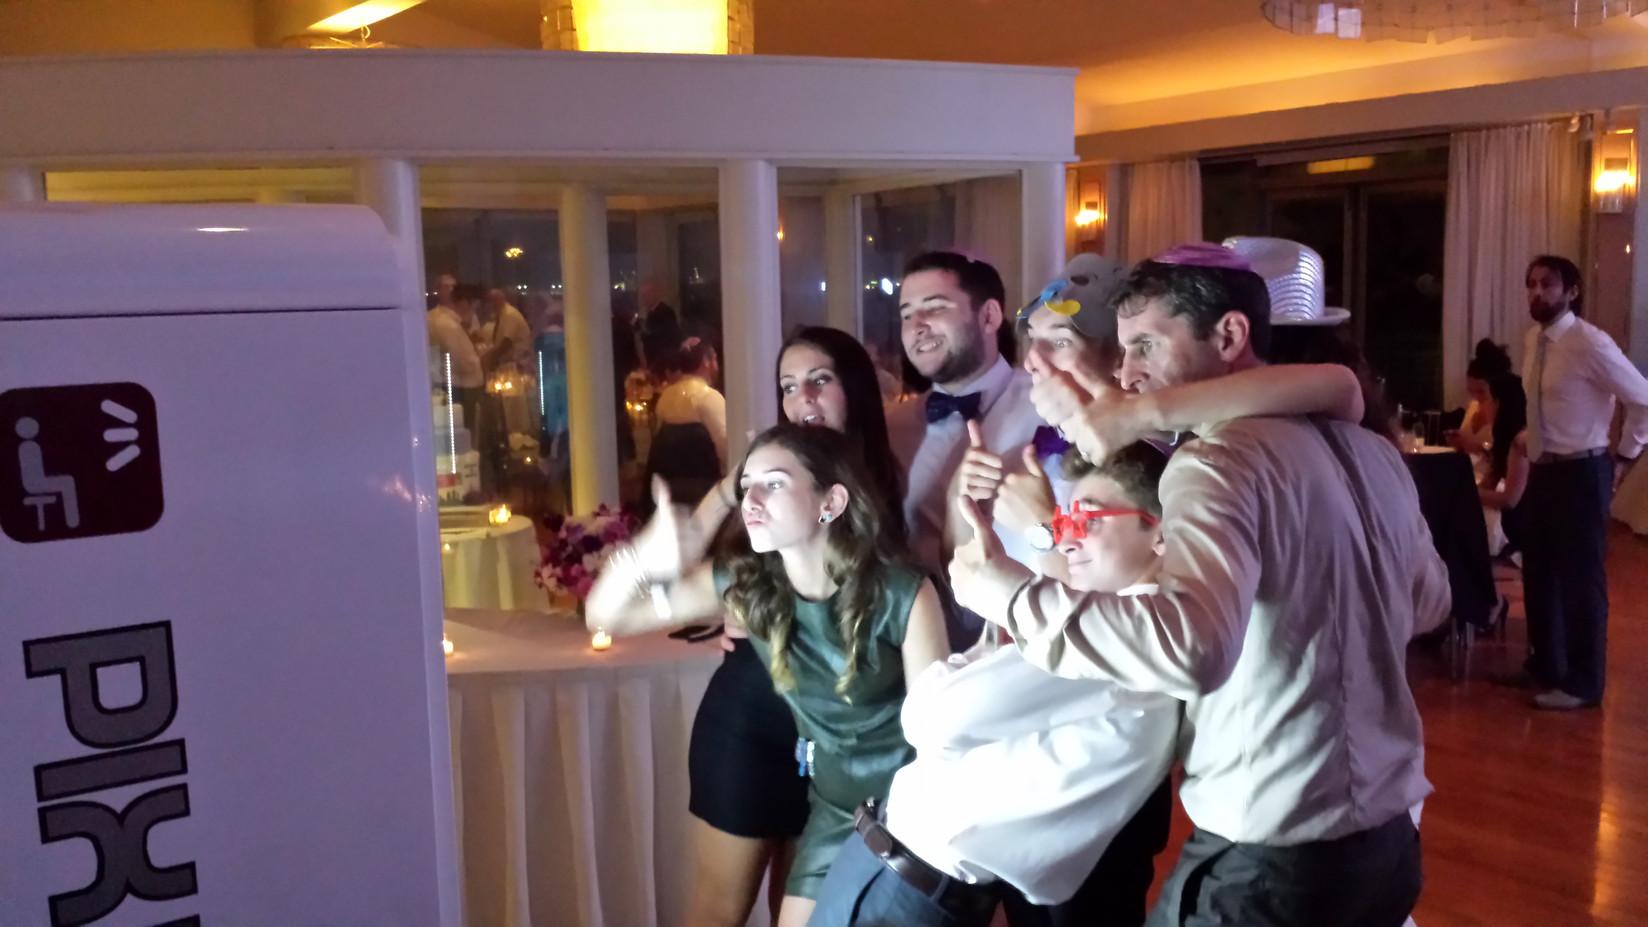 Giant-Selfie-Machine-At-Wedding.jpg